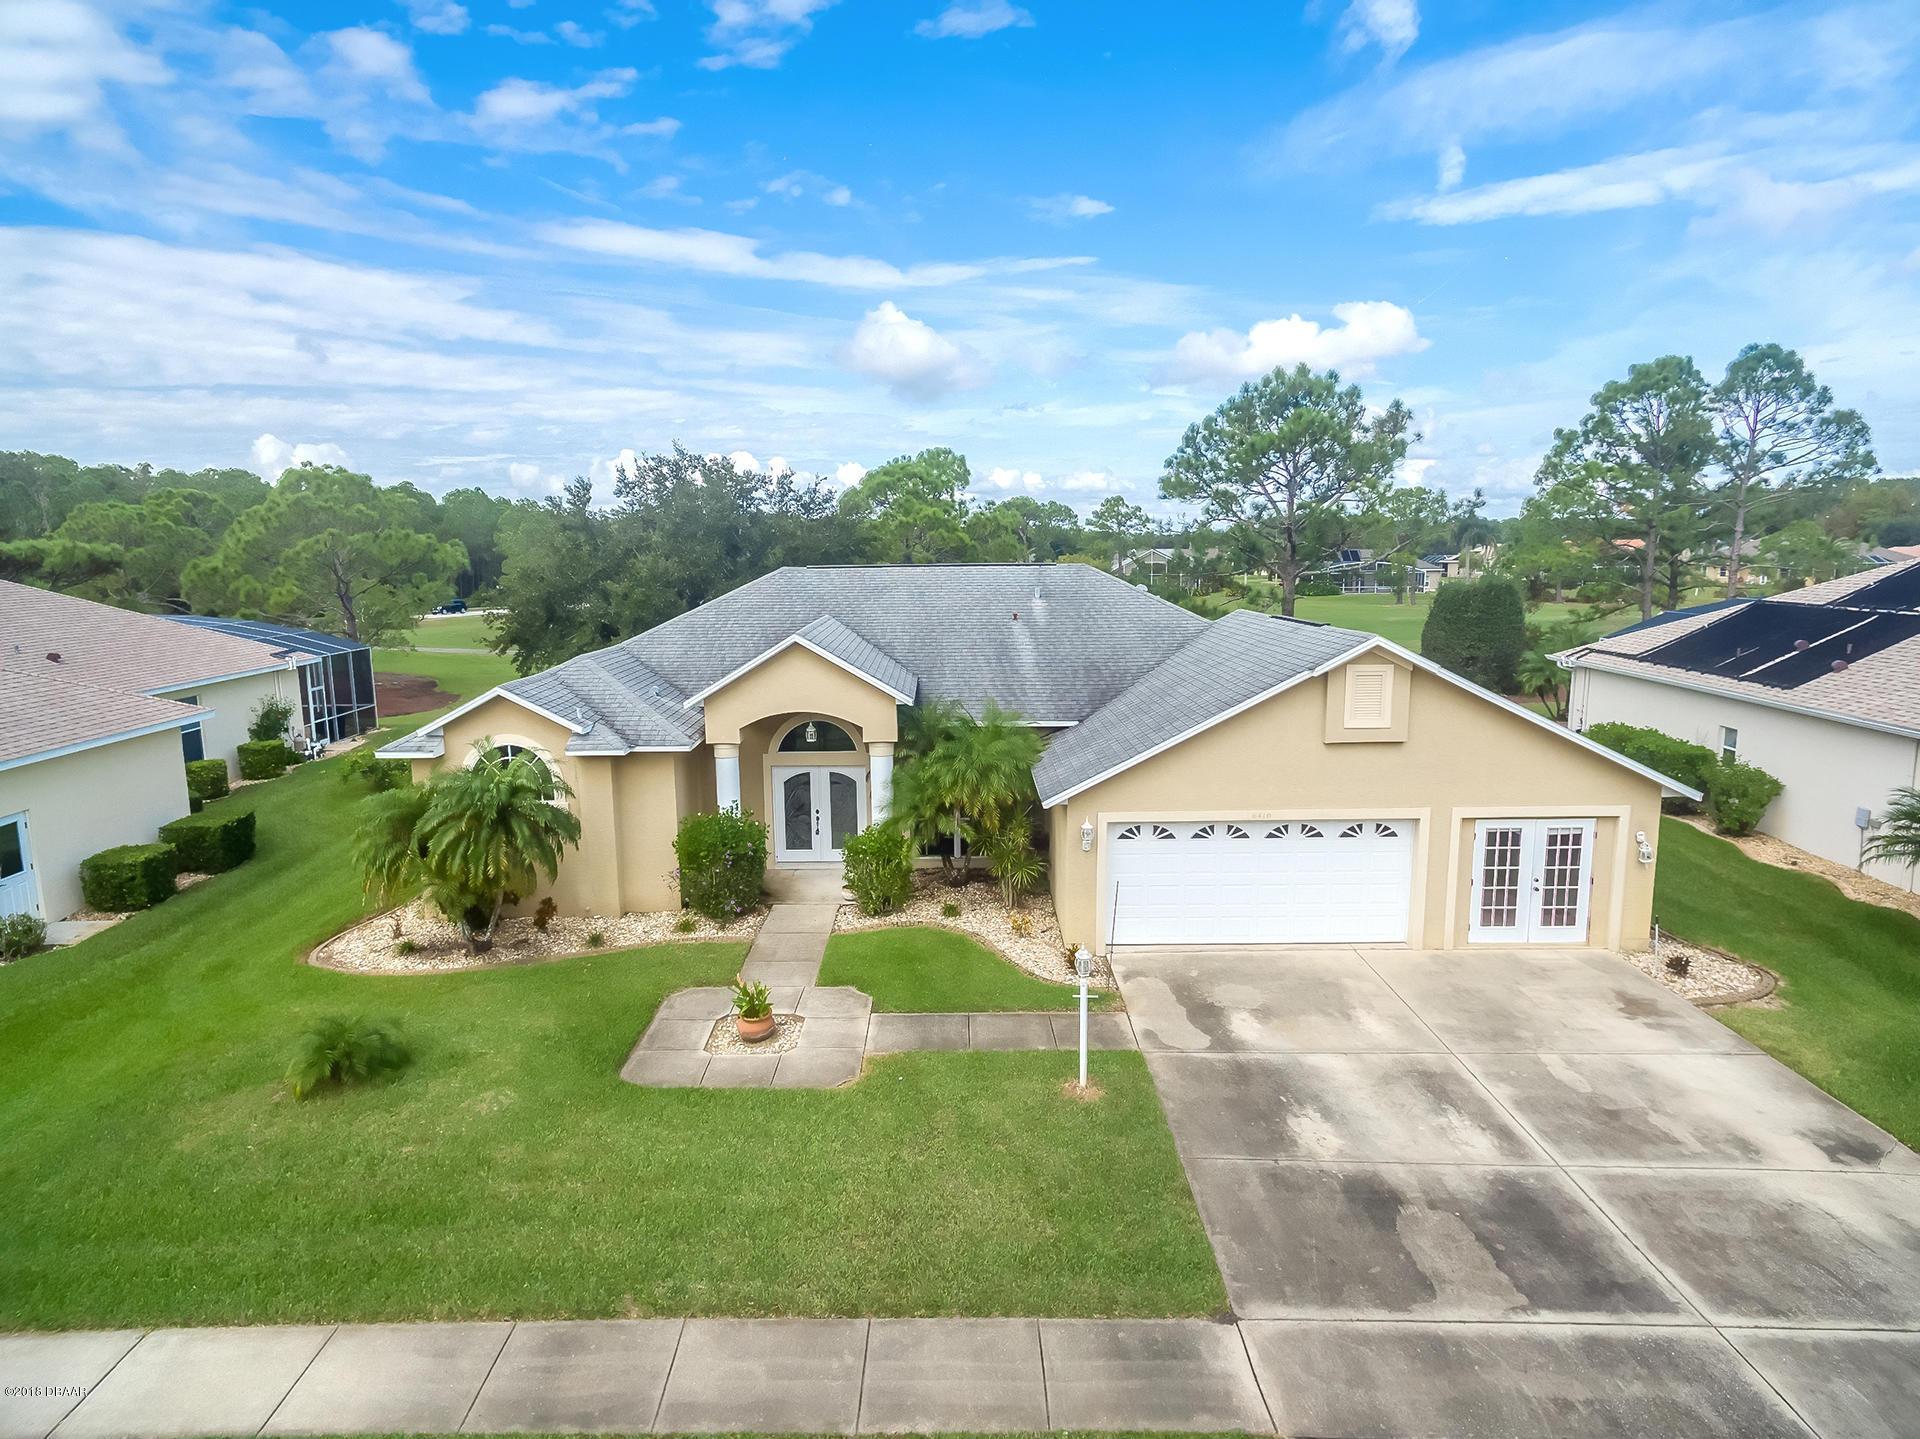 Photo of 6410 Longlake Drive, Port Orange, FL 32128